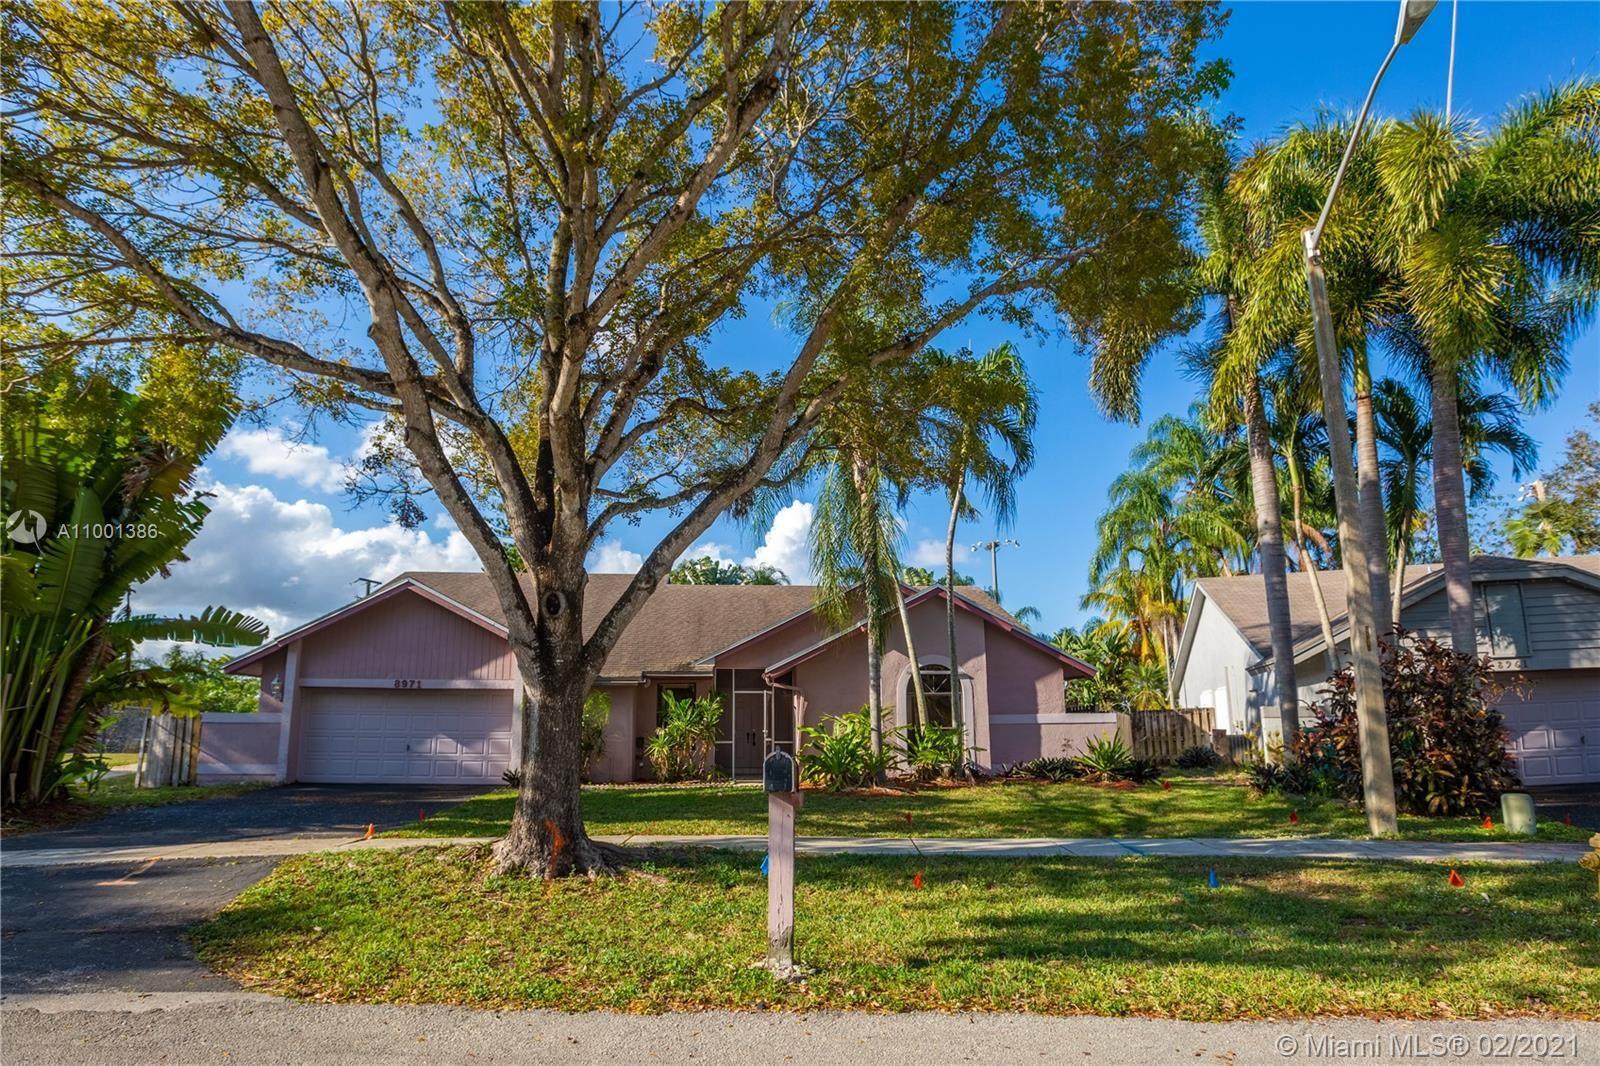 Photo of 8971 SW 57th St, Cooper City, FL 33328 (MLS # A11001386)